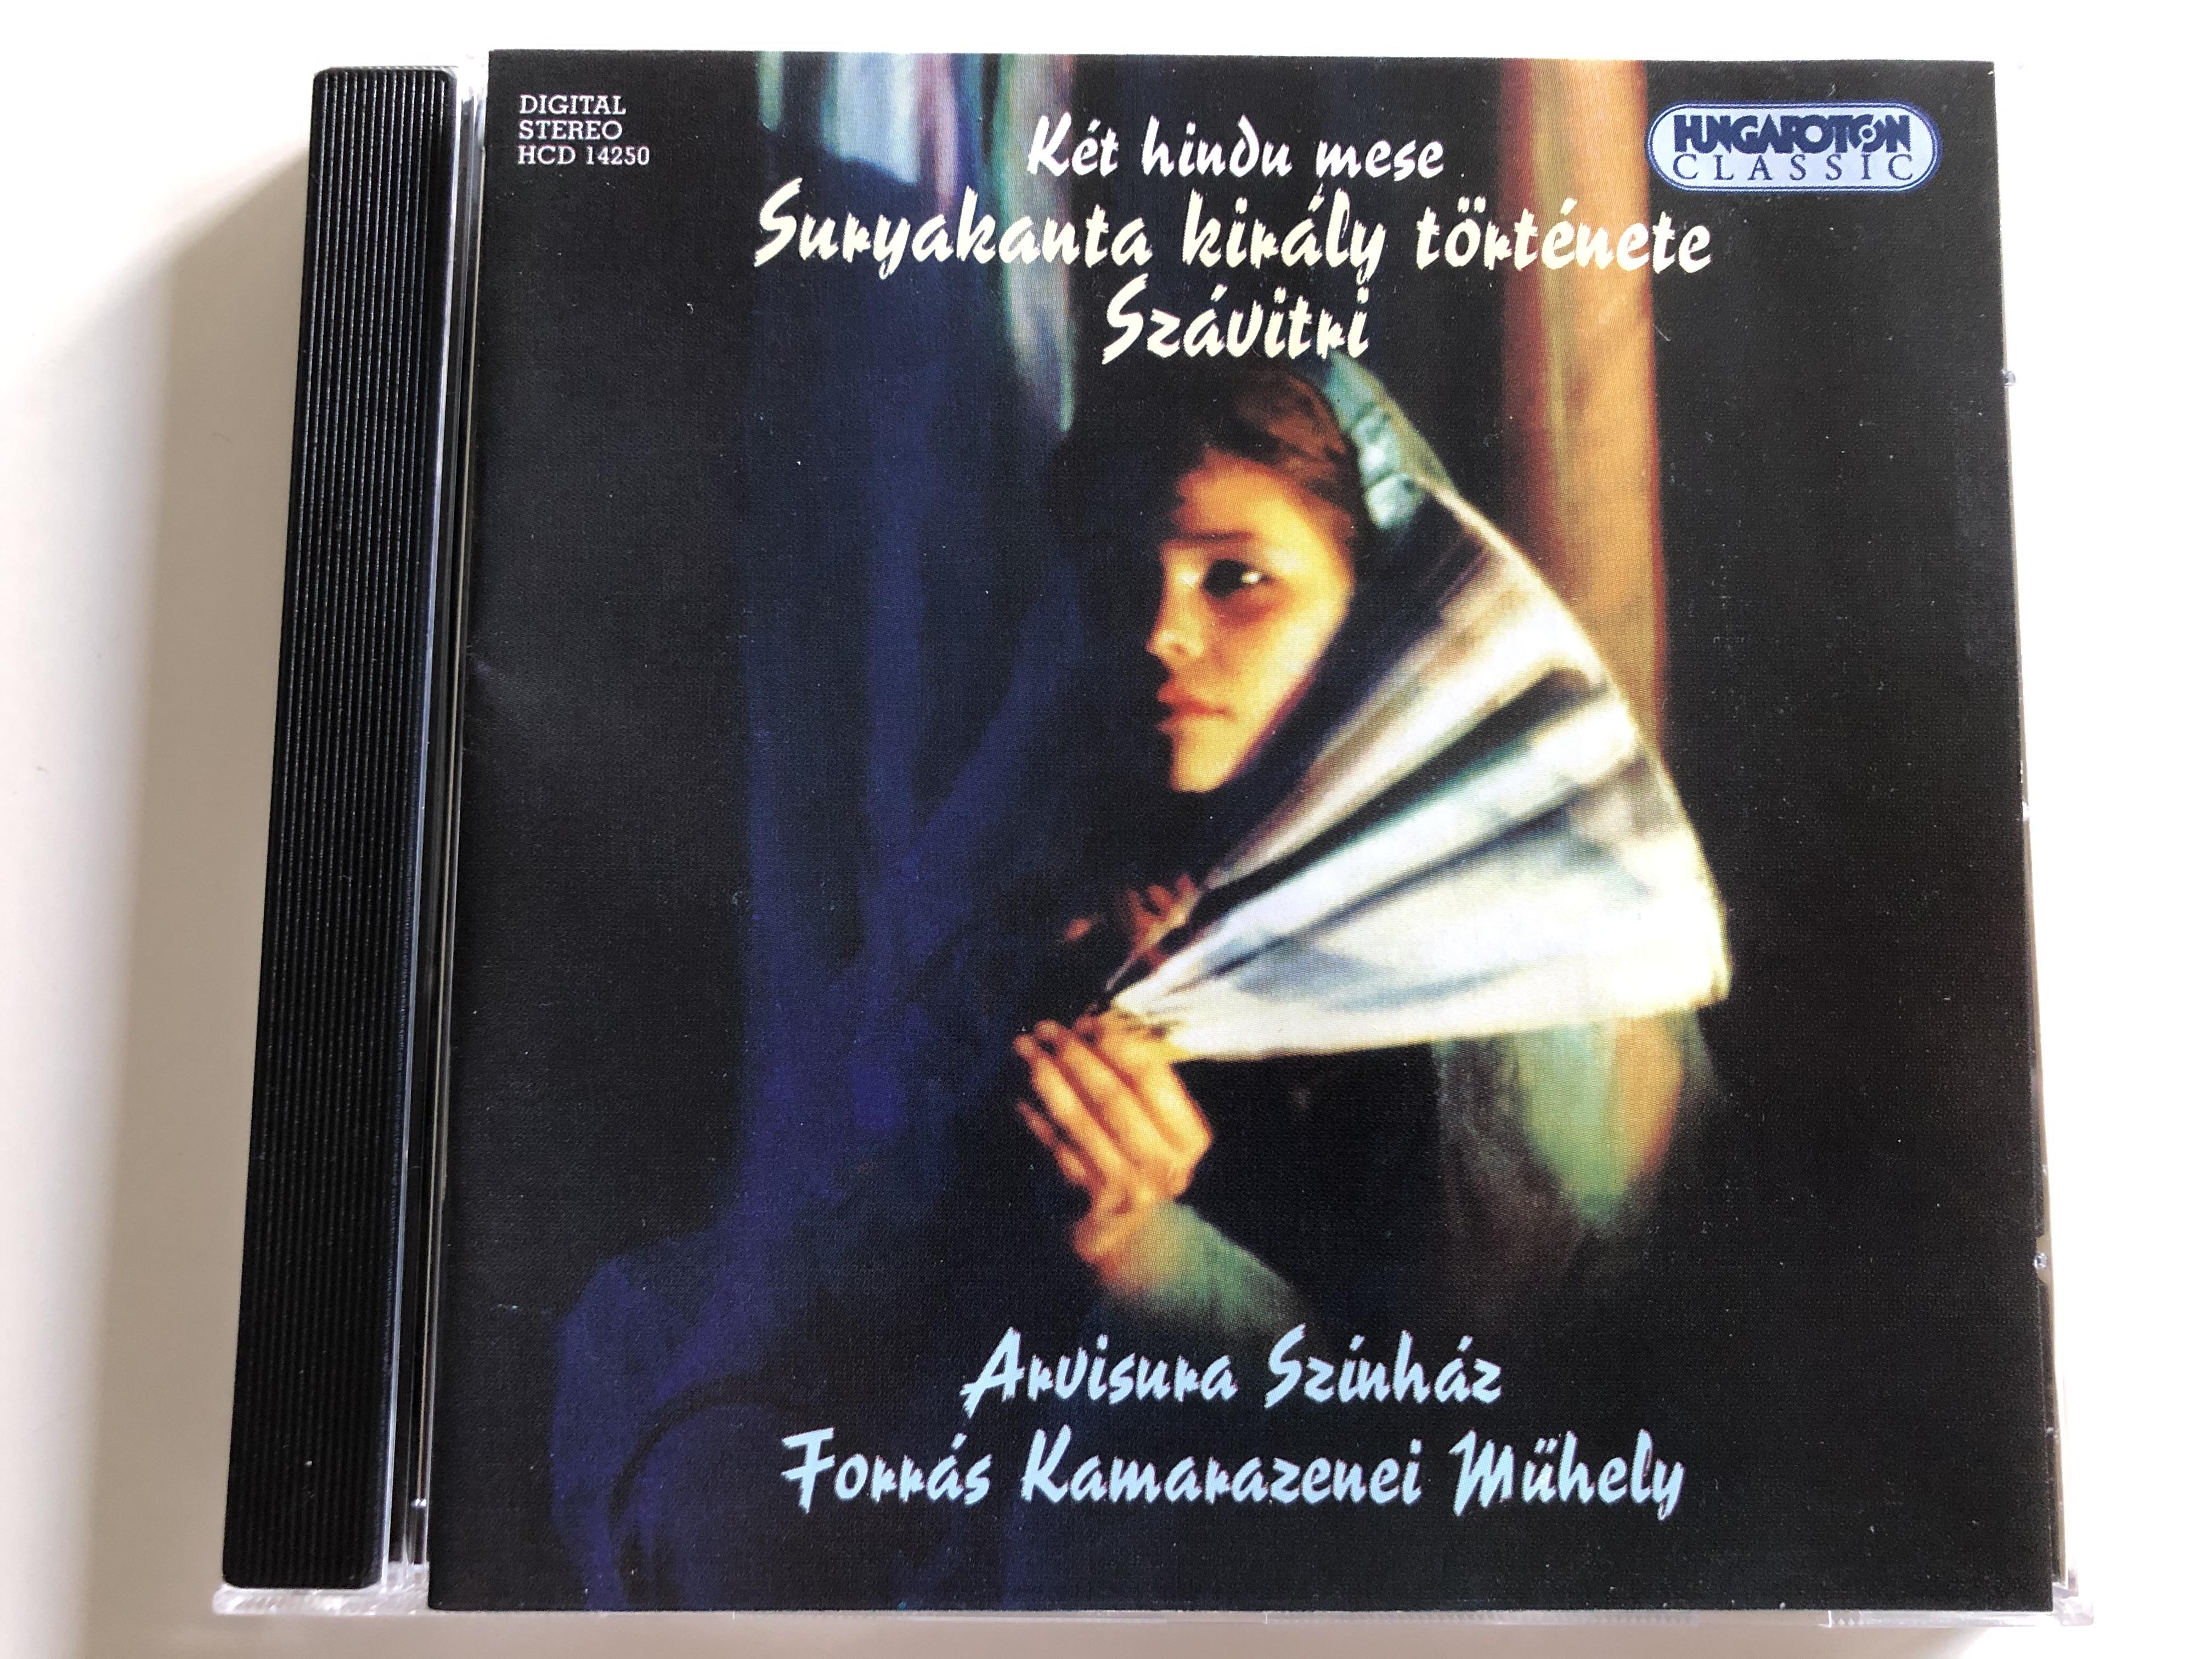 k-t-hindu-mese-suryakanta-kir-ly-t-rt-nete-sz-vitri-arvisura-sz-nh-z-forr-s-kamarazenei-m-hely-hungaroton-classic-audio-cd-1997-hcd-14250-1-.jpg